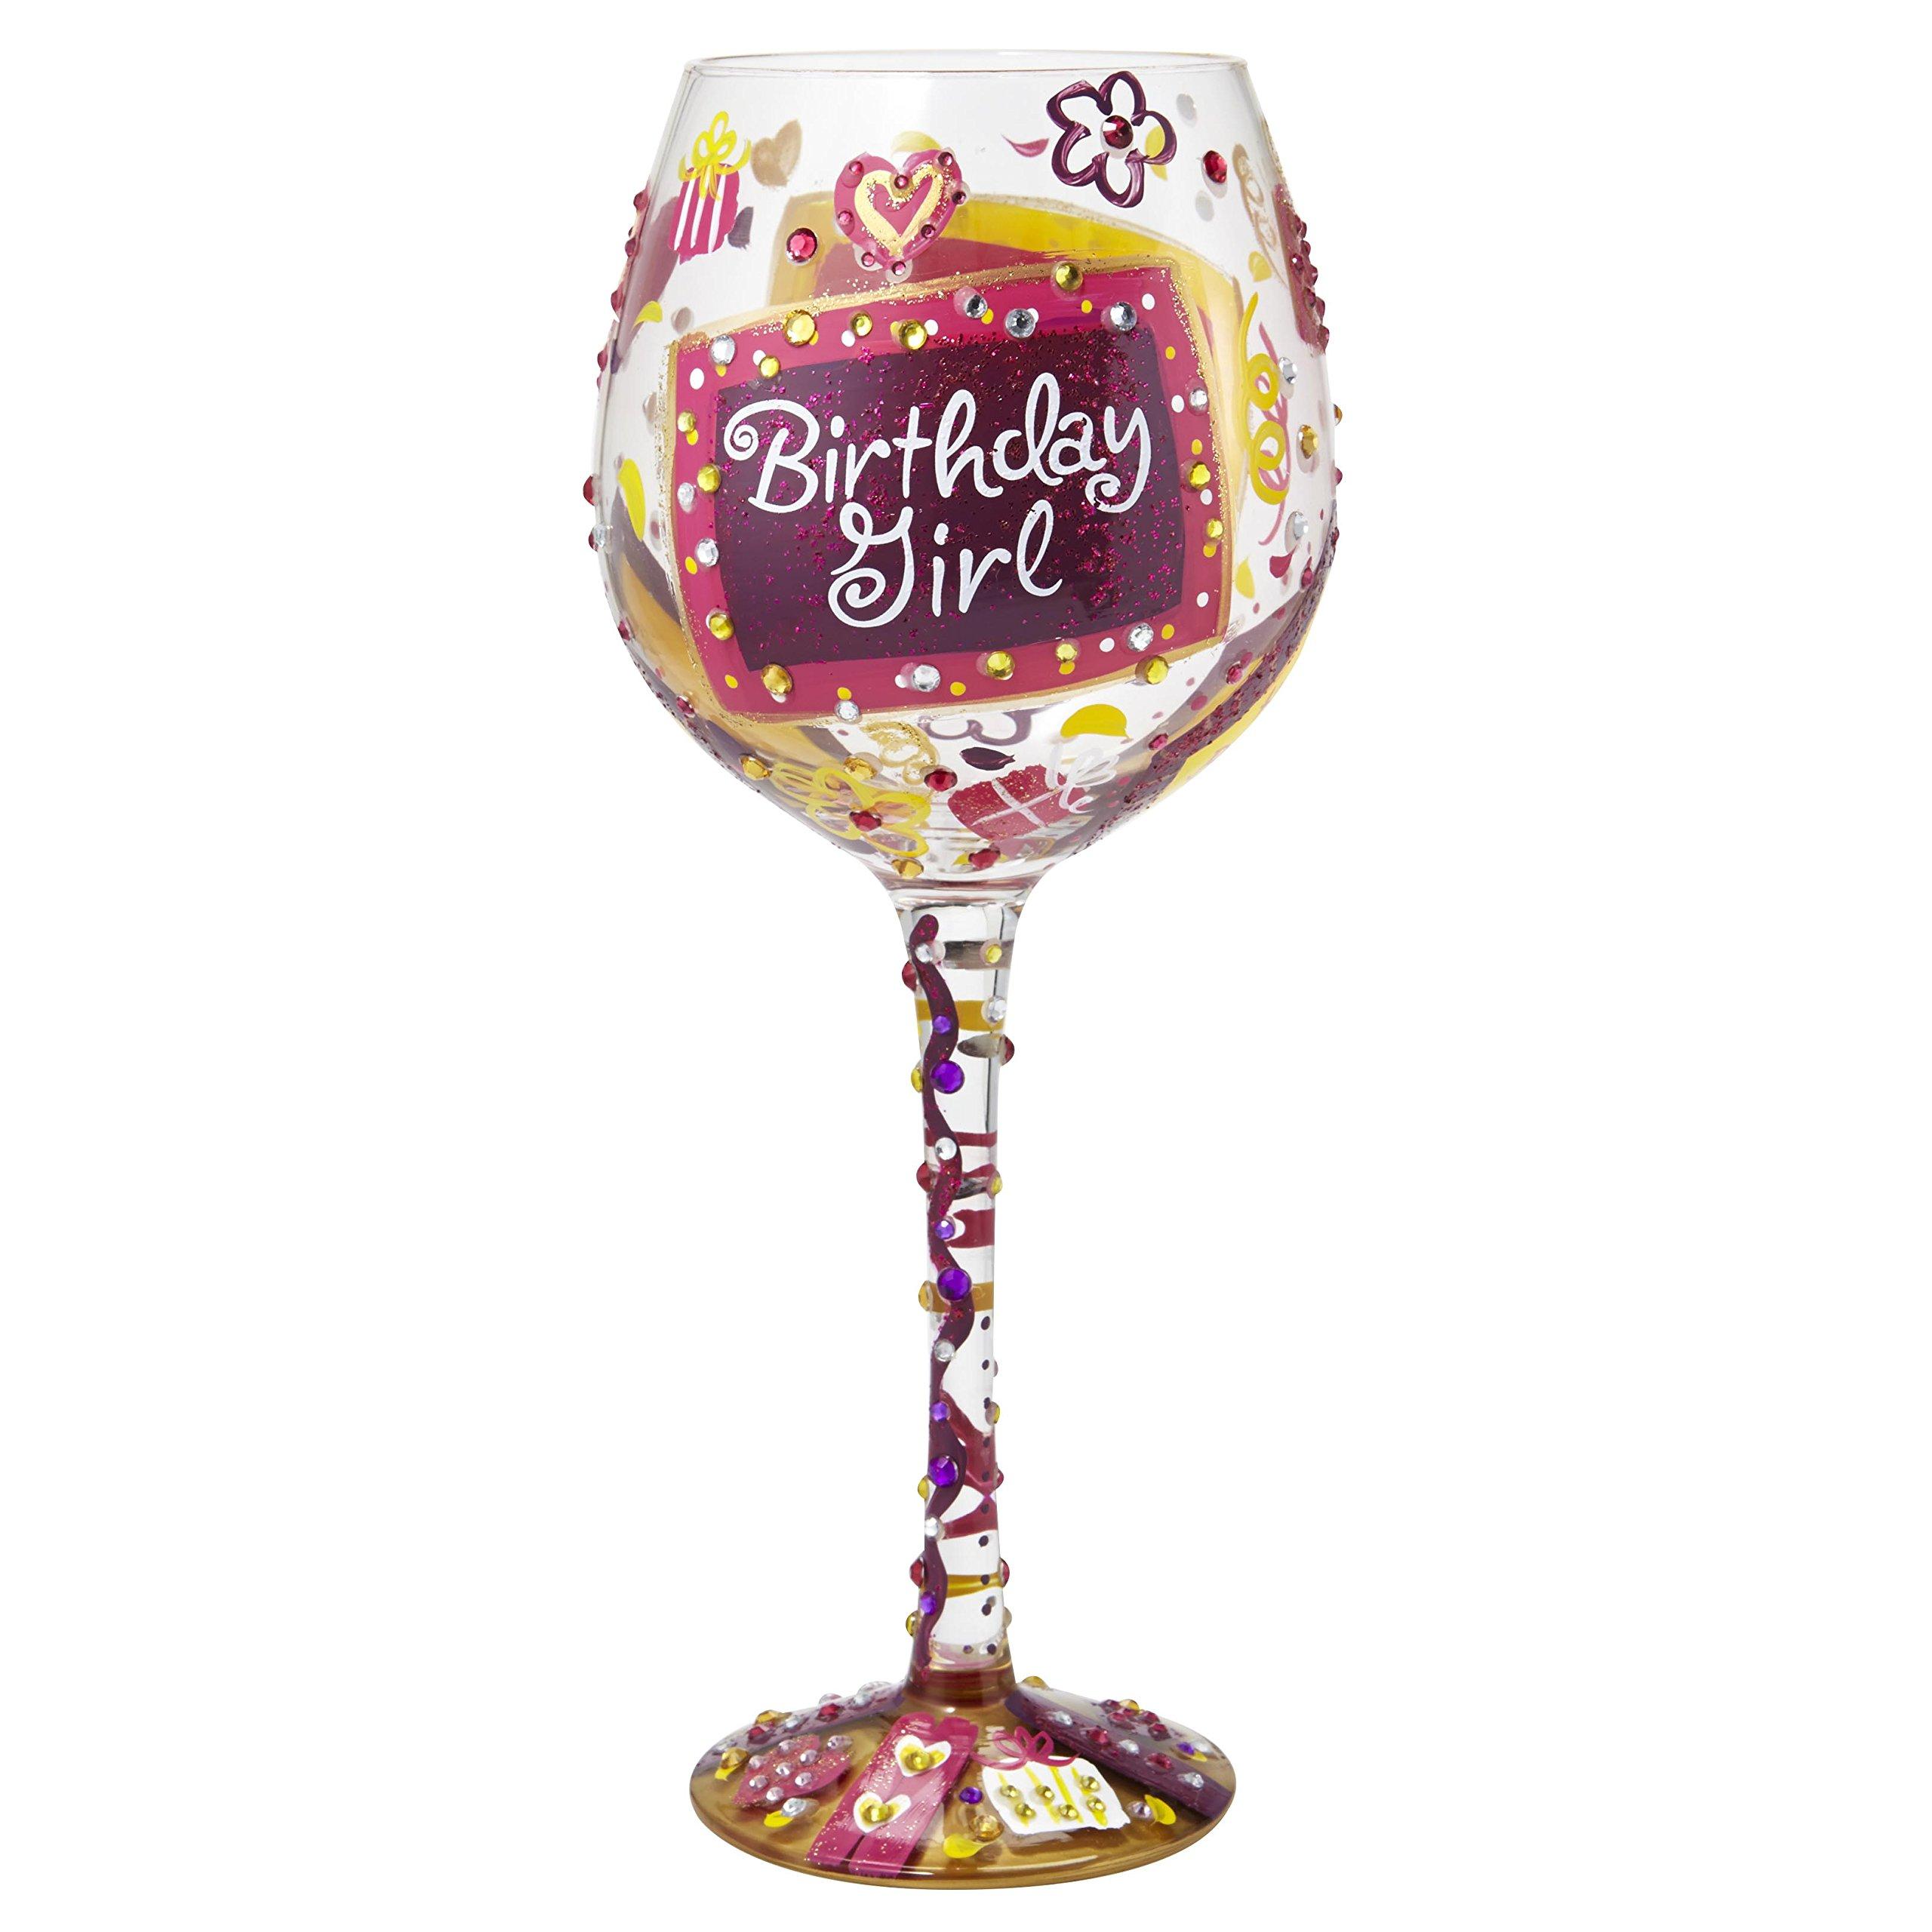 "Designs by Lolita ""Bling Birthday Girl"" Hand-painted Artisan Super Bling Wine Glass, 22 oz."